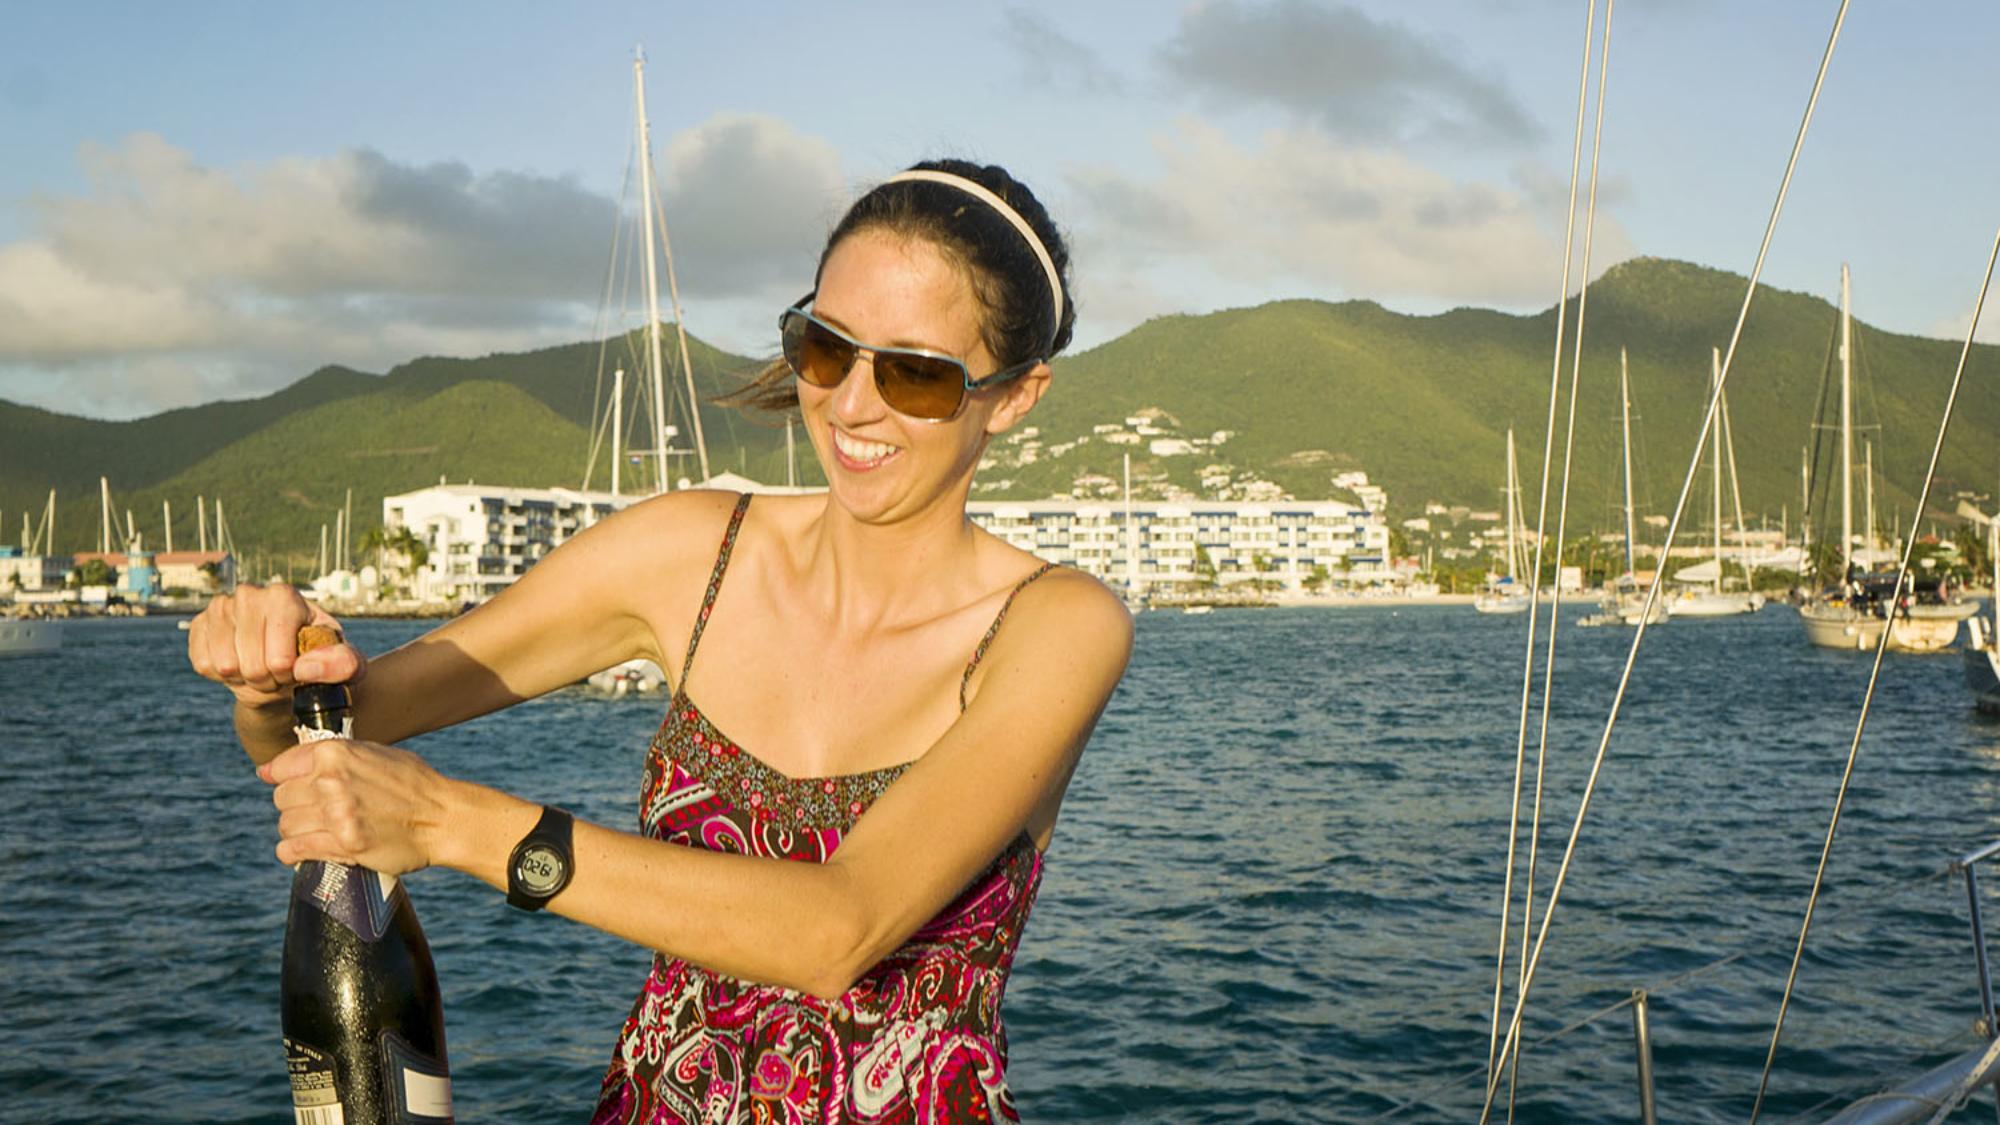 champagne celebration at Sint Maarten